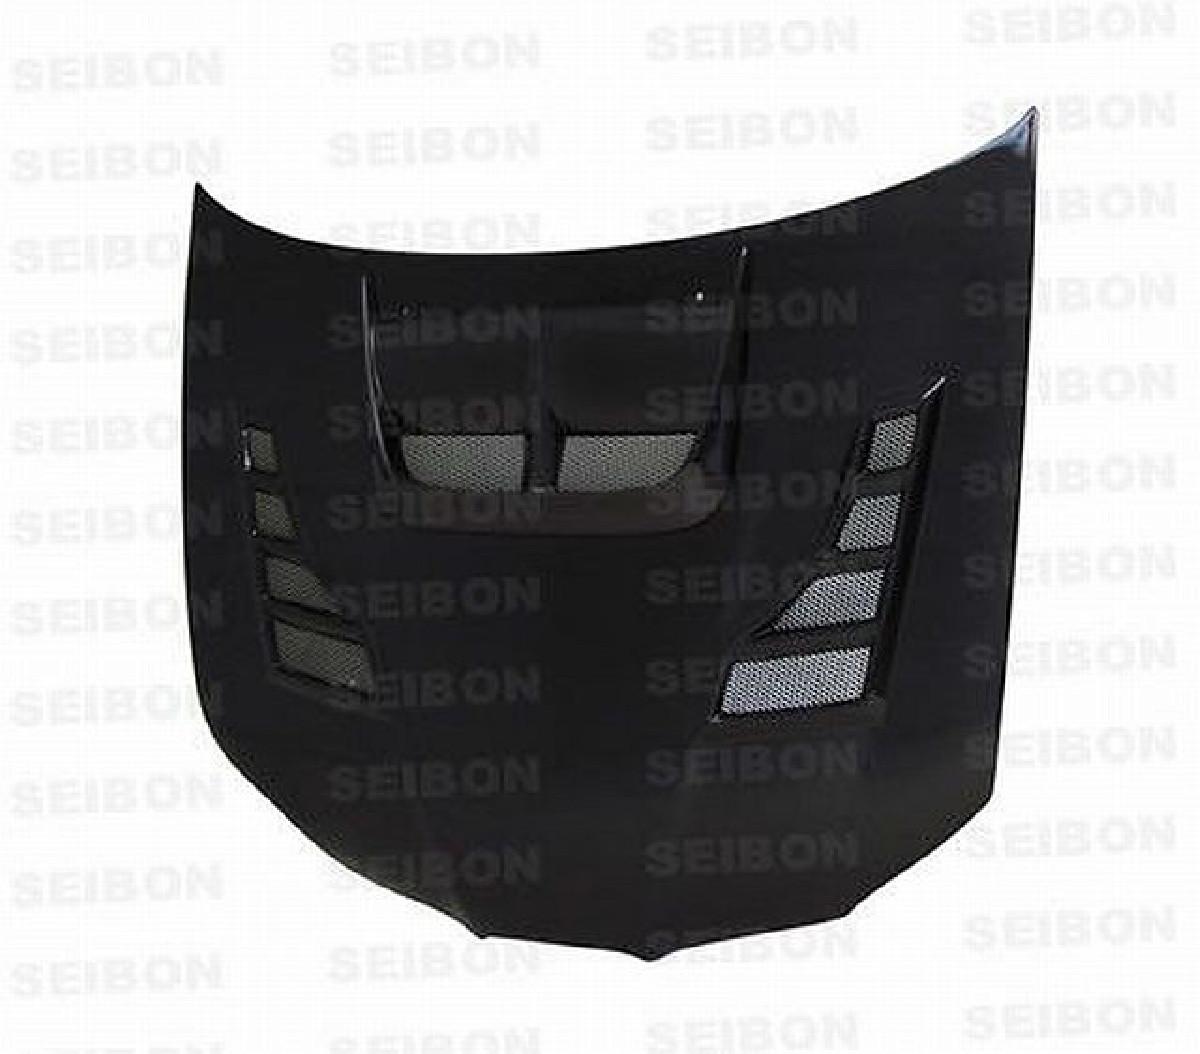 Seibon CW Carbon Motorhaube Subaru Impreza WRX/STI 06-07